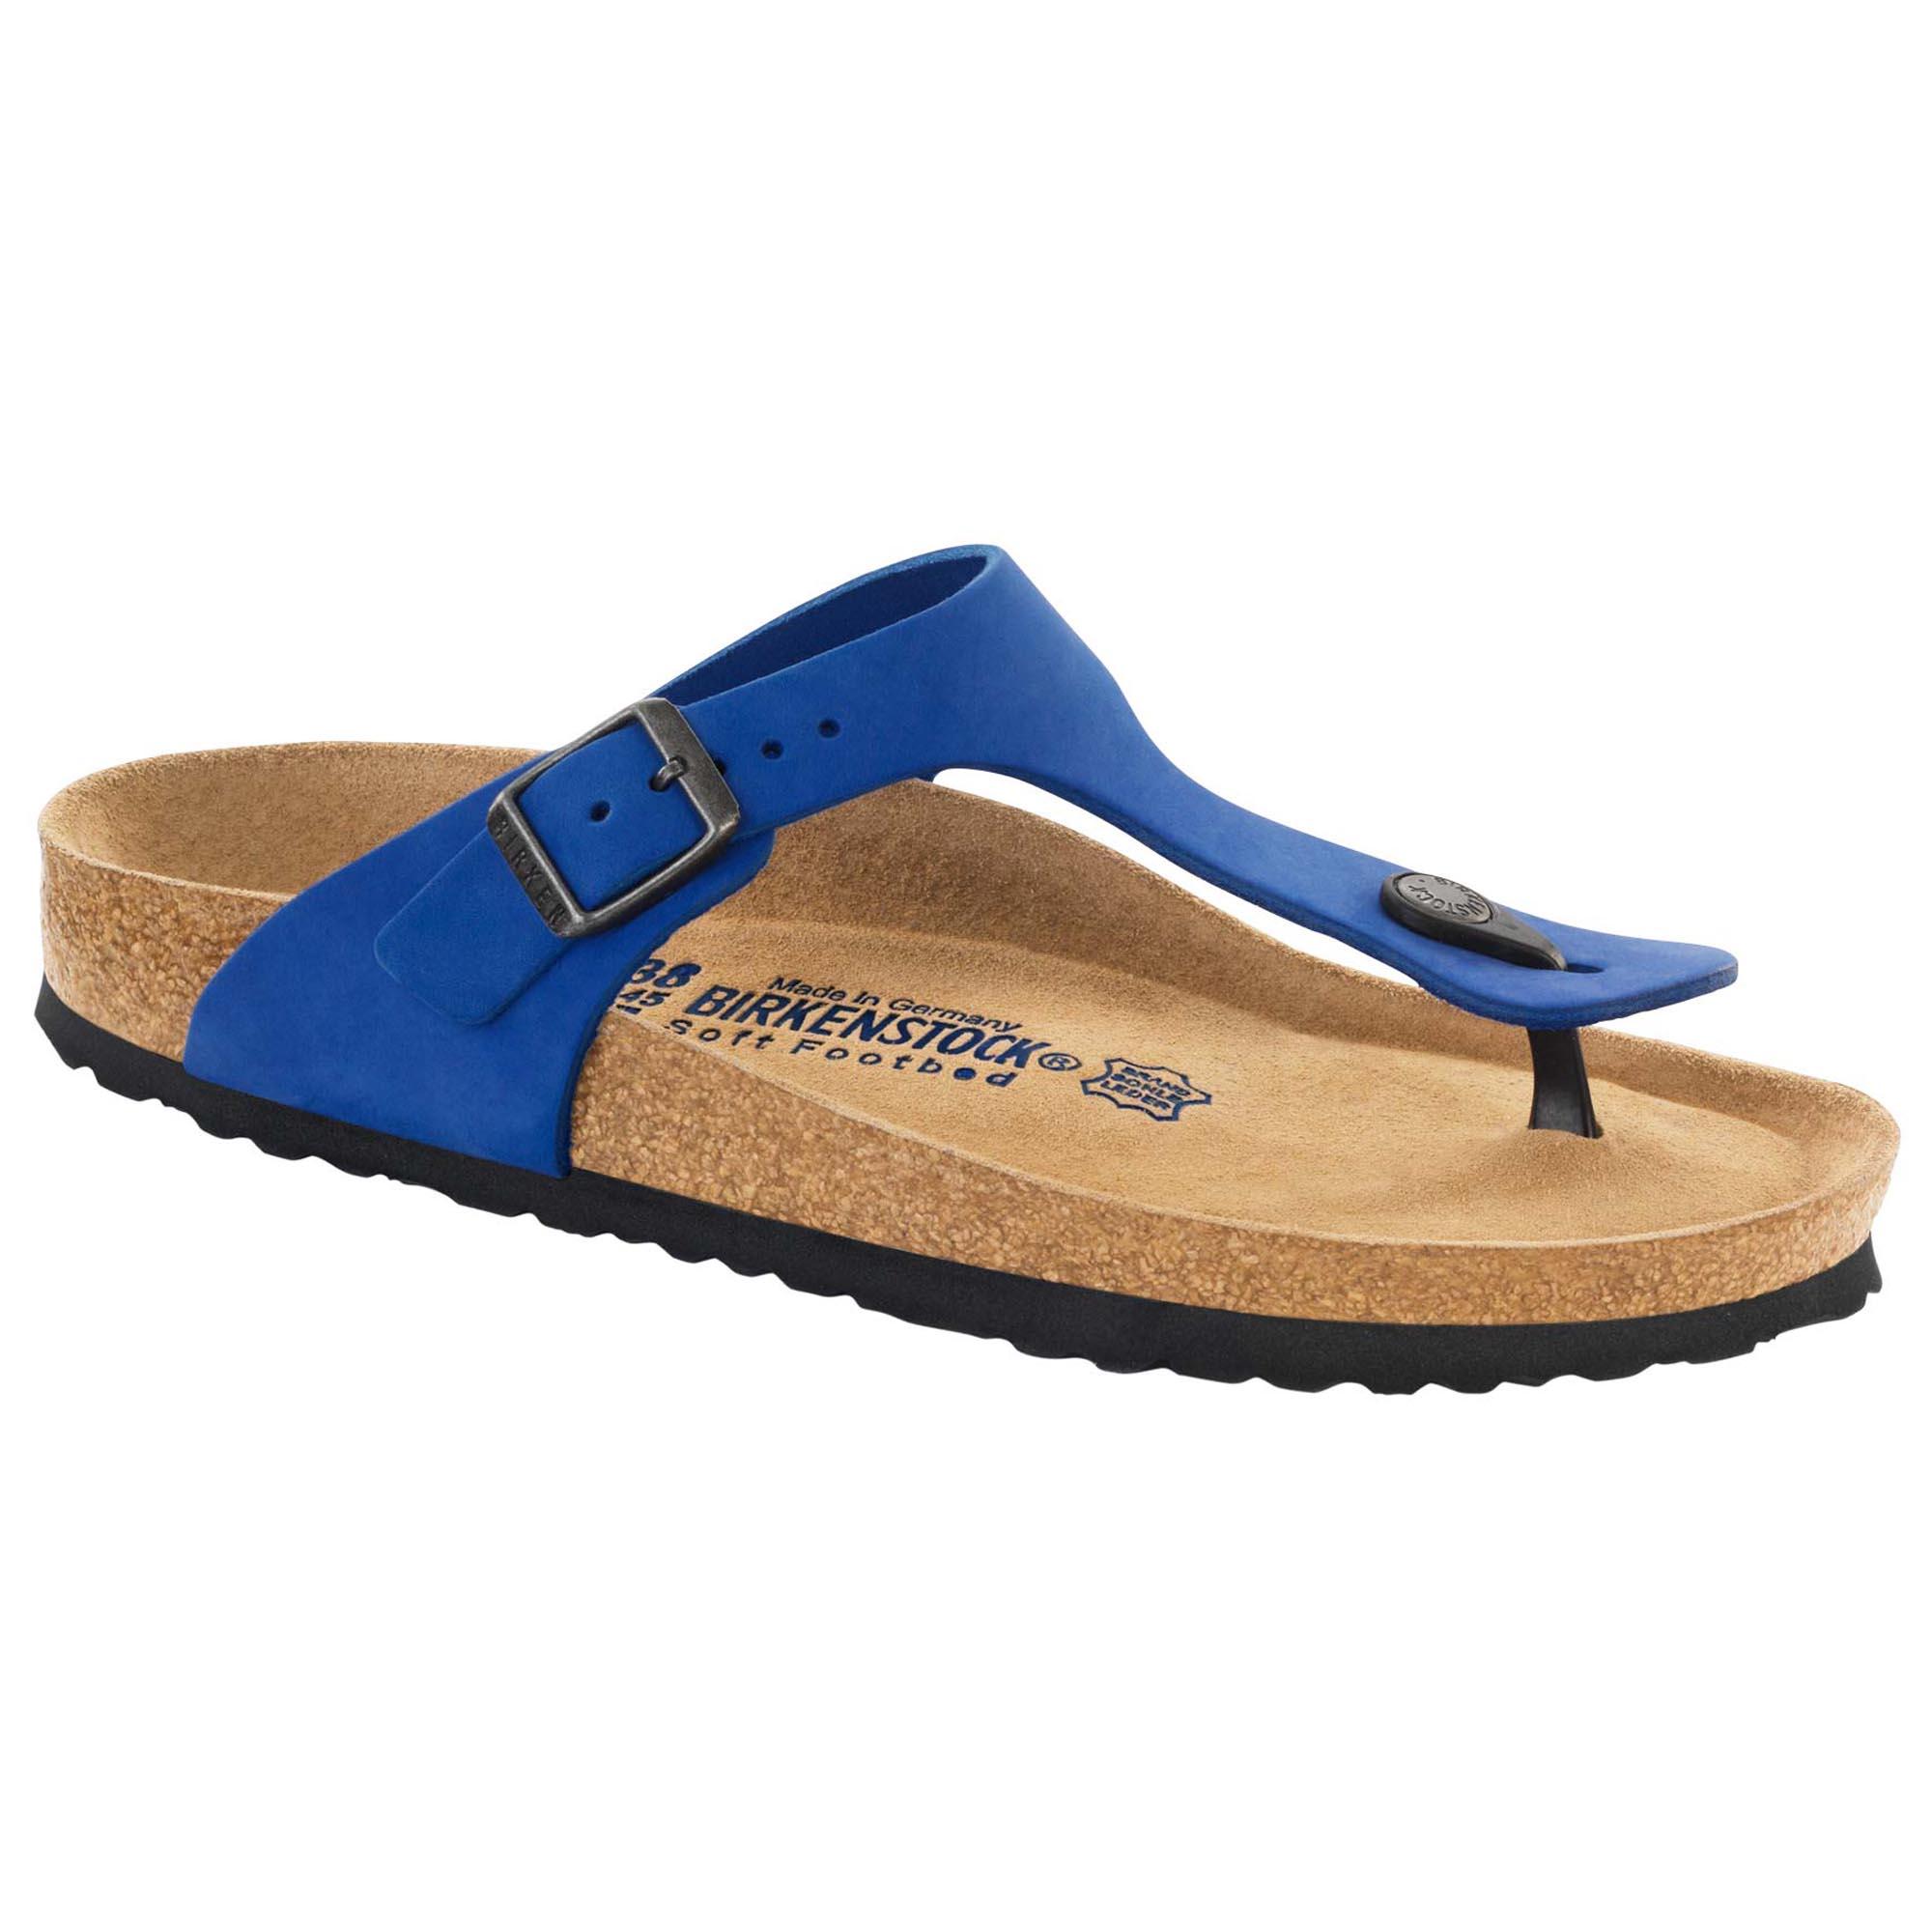 b042949aeac1 Gizeh Nubuck Leather Blue